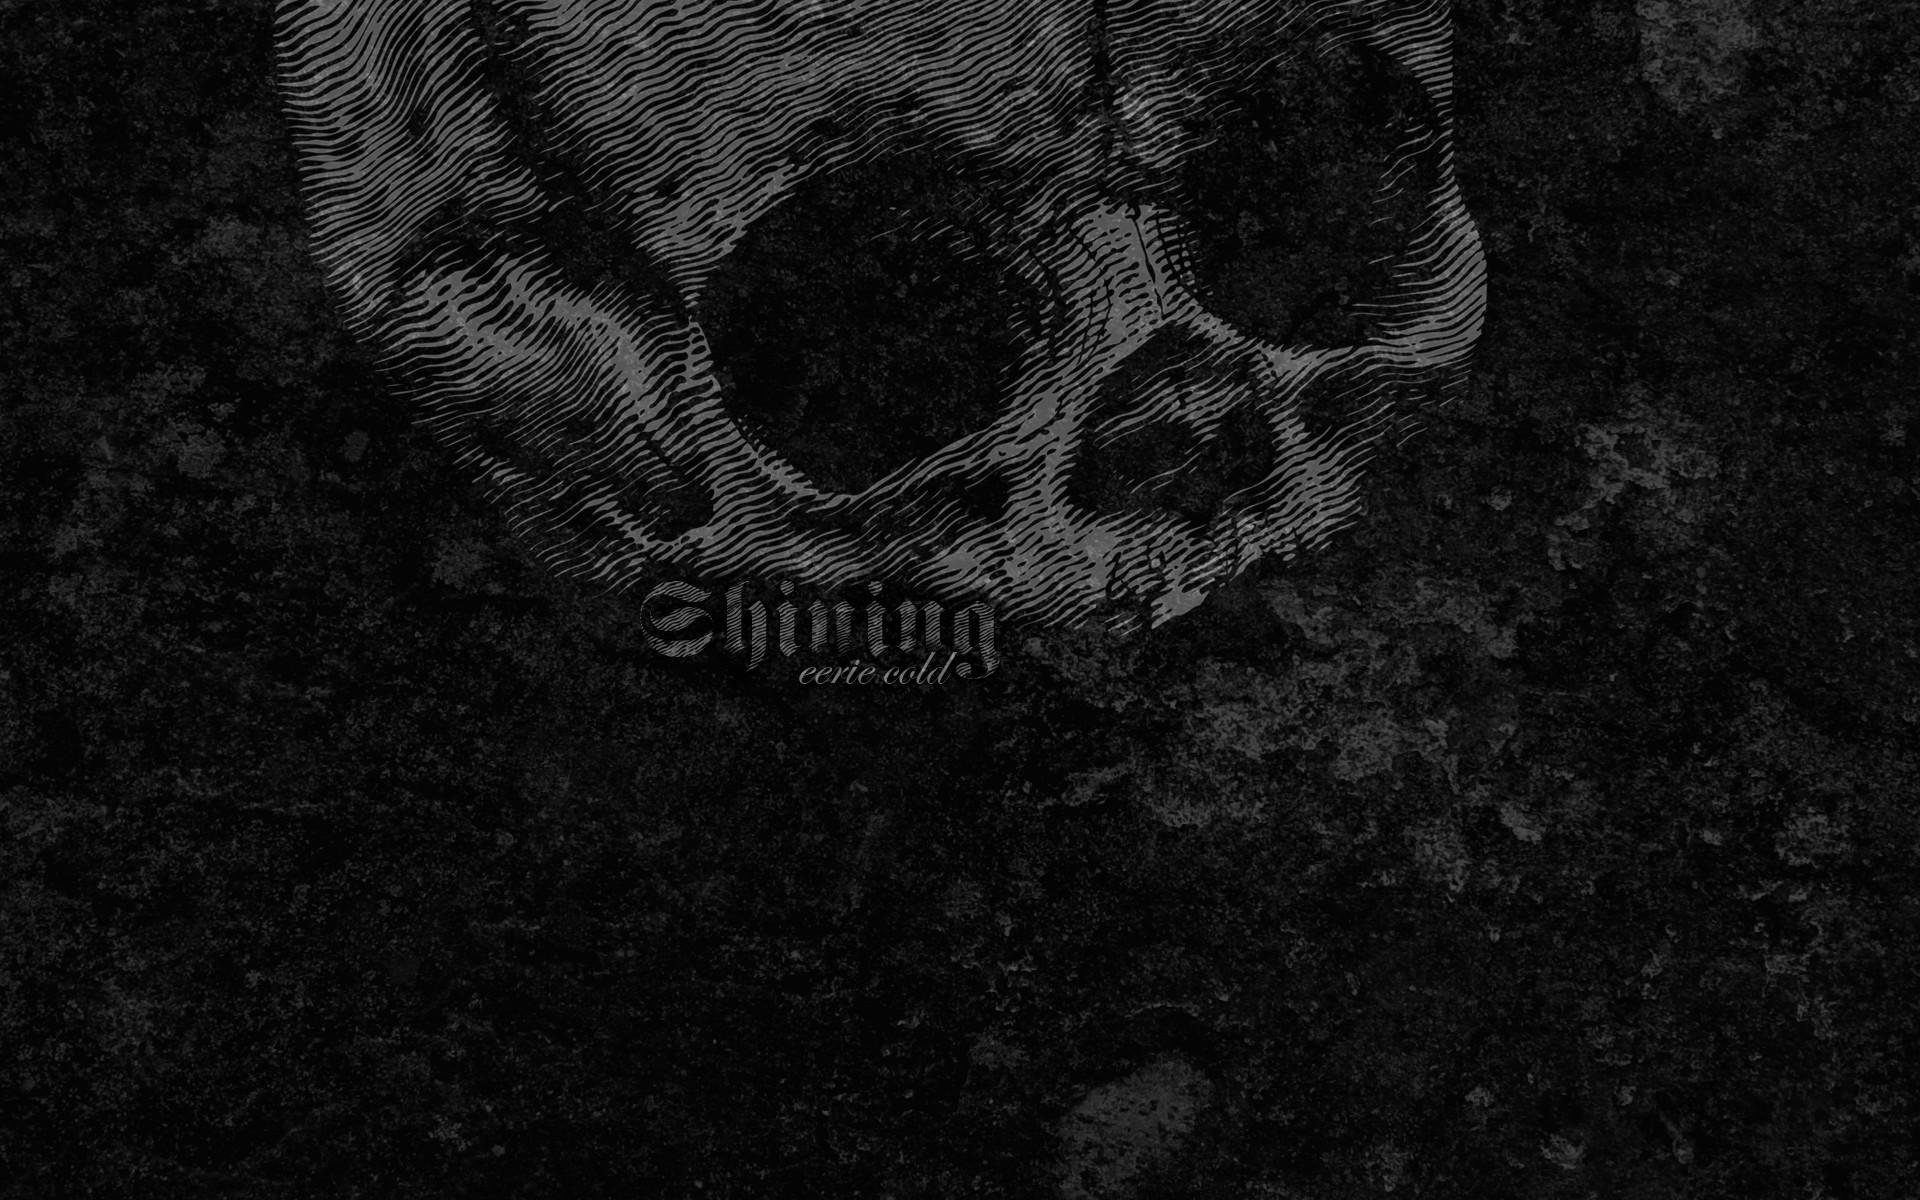 Black Metal Wallpapers Top Free Black Metal Backgrounds Wallpaperaccess